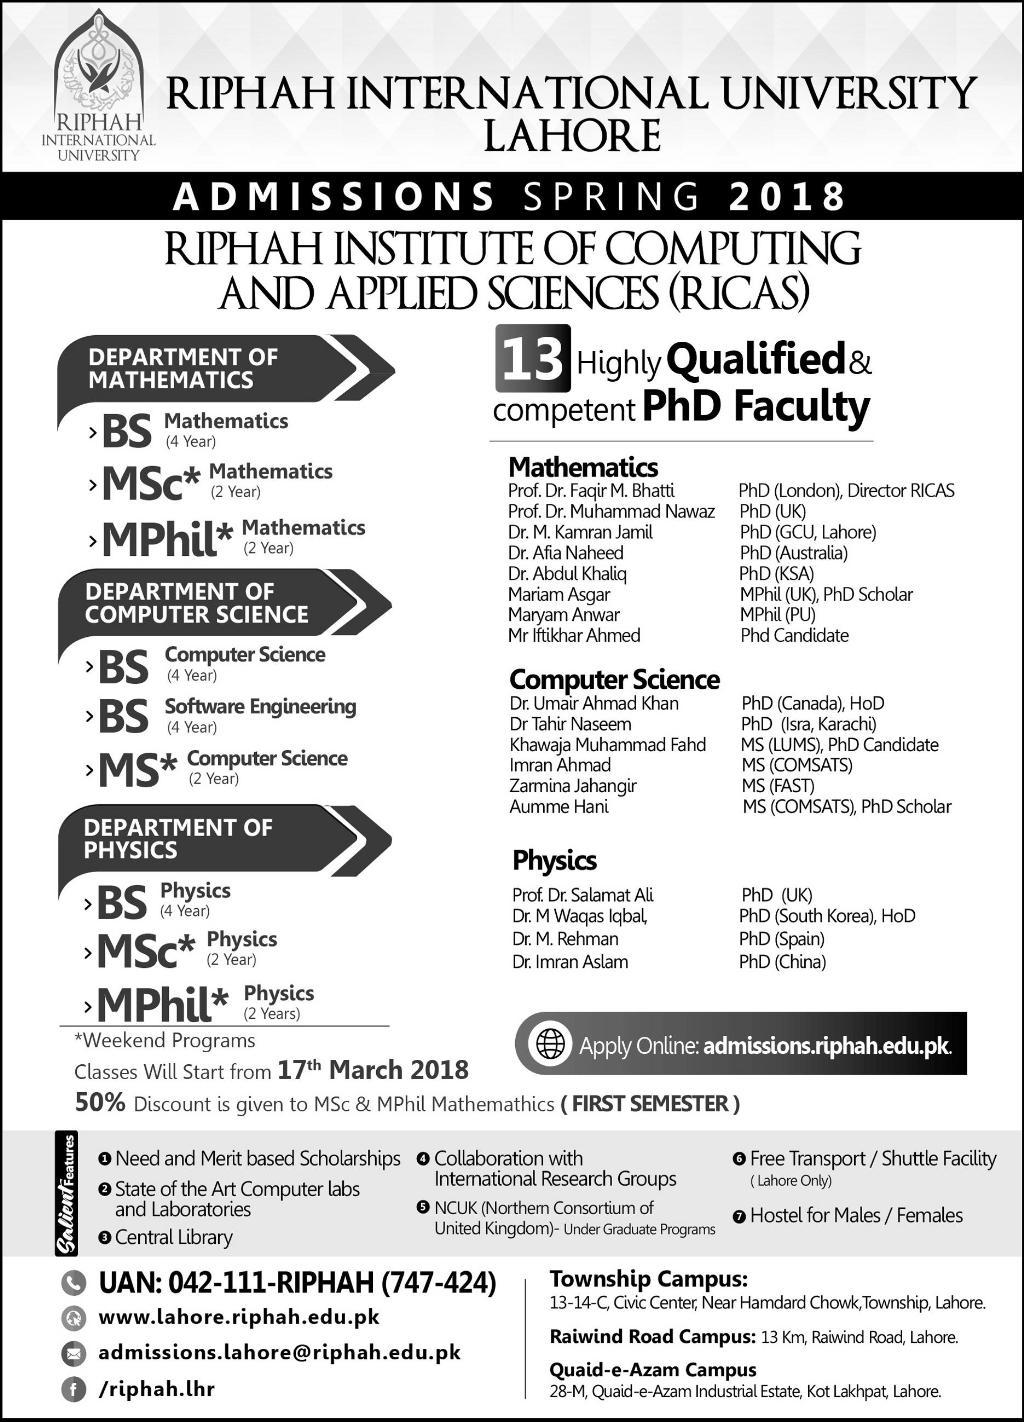 Riphah International University Lahore Campus Admissions 2018